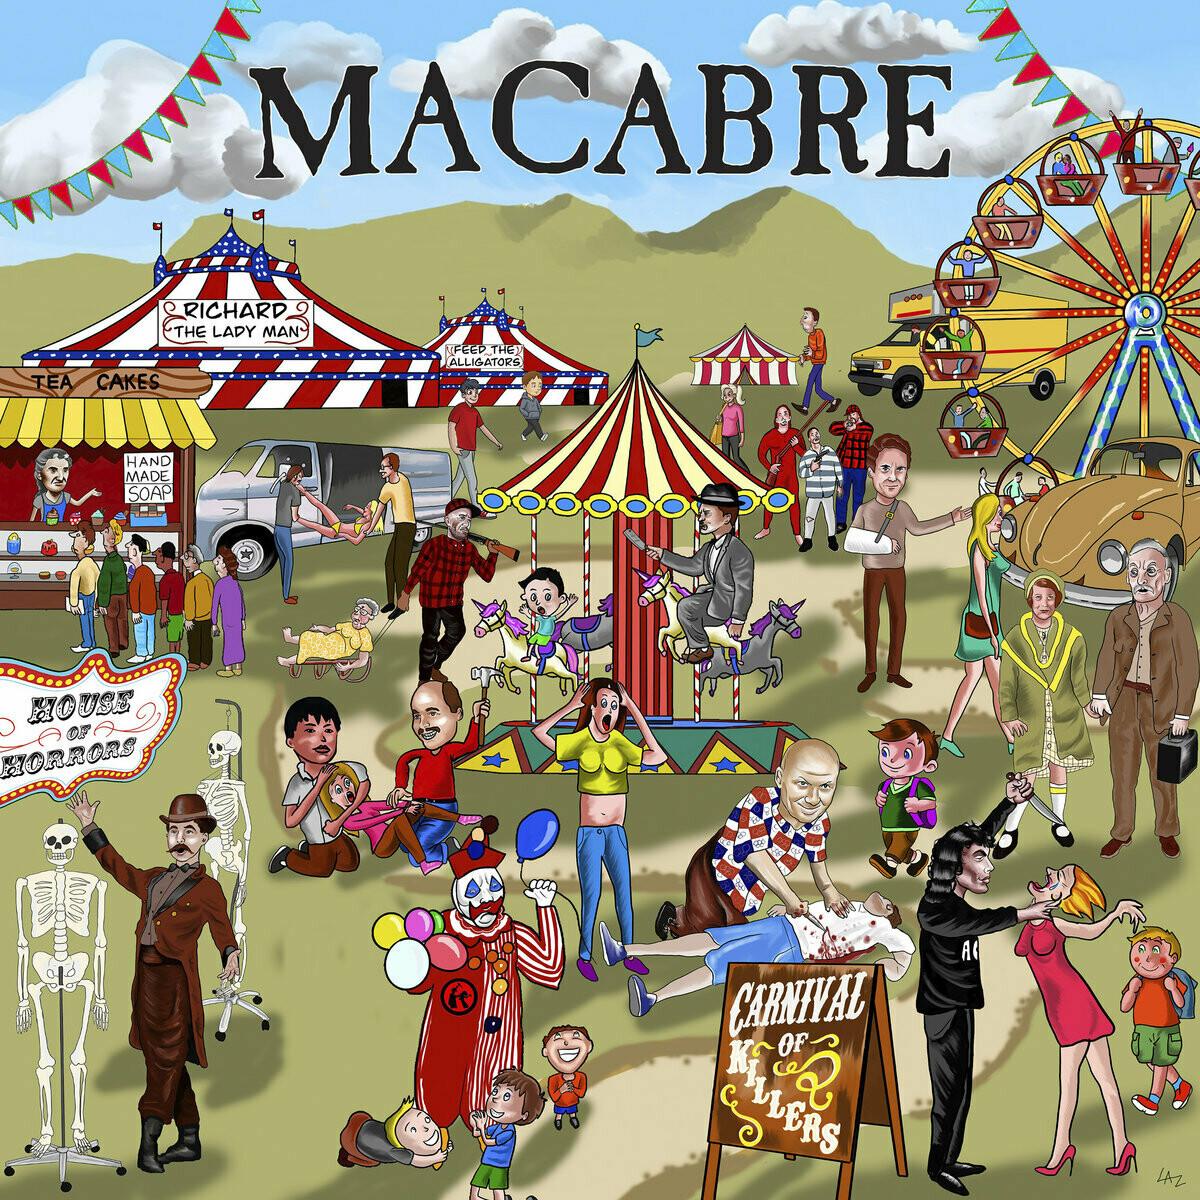 Macabre / Carnival Of Killers